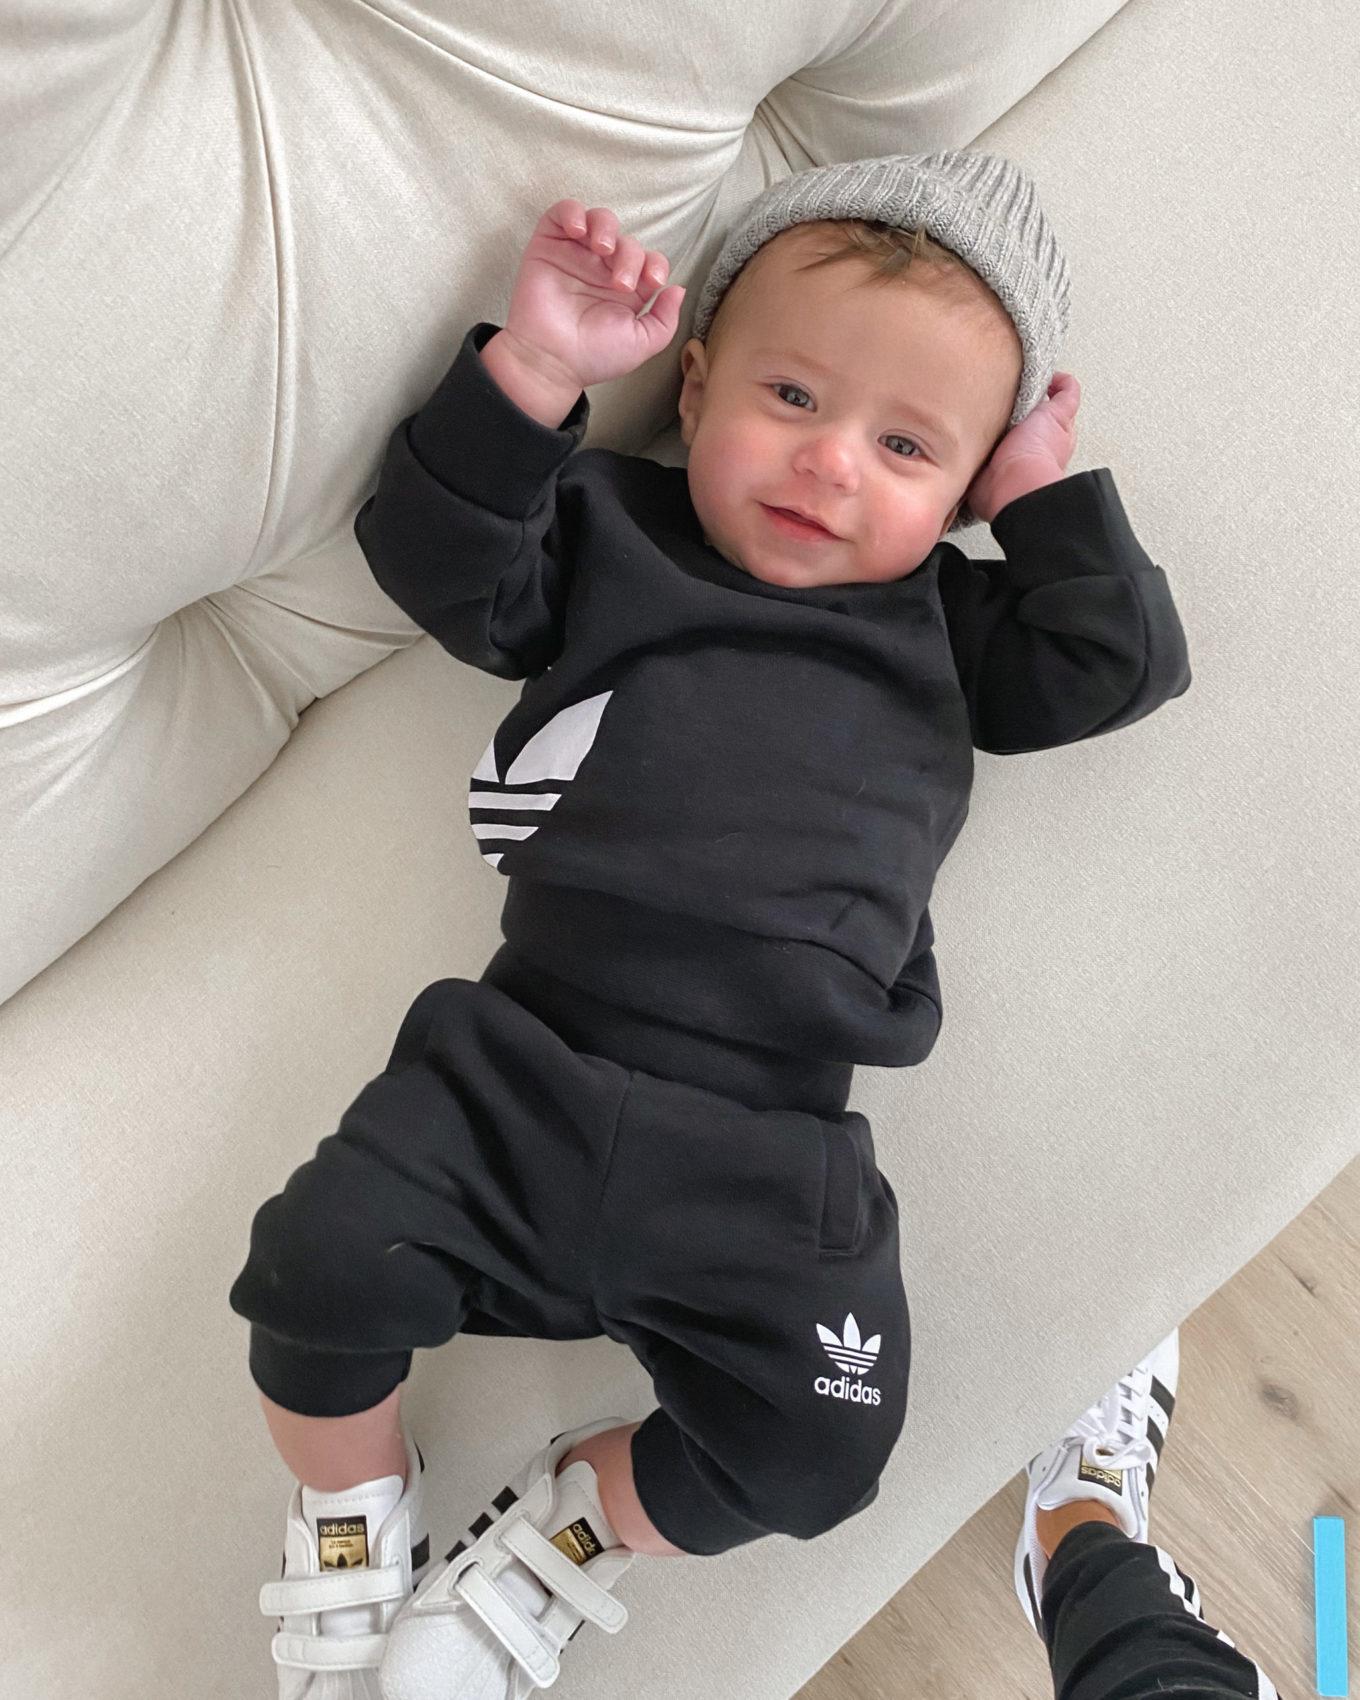 baby adidas